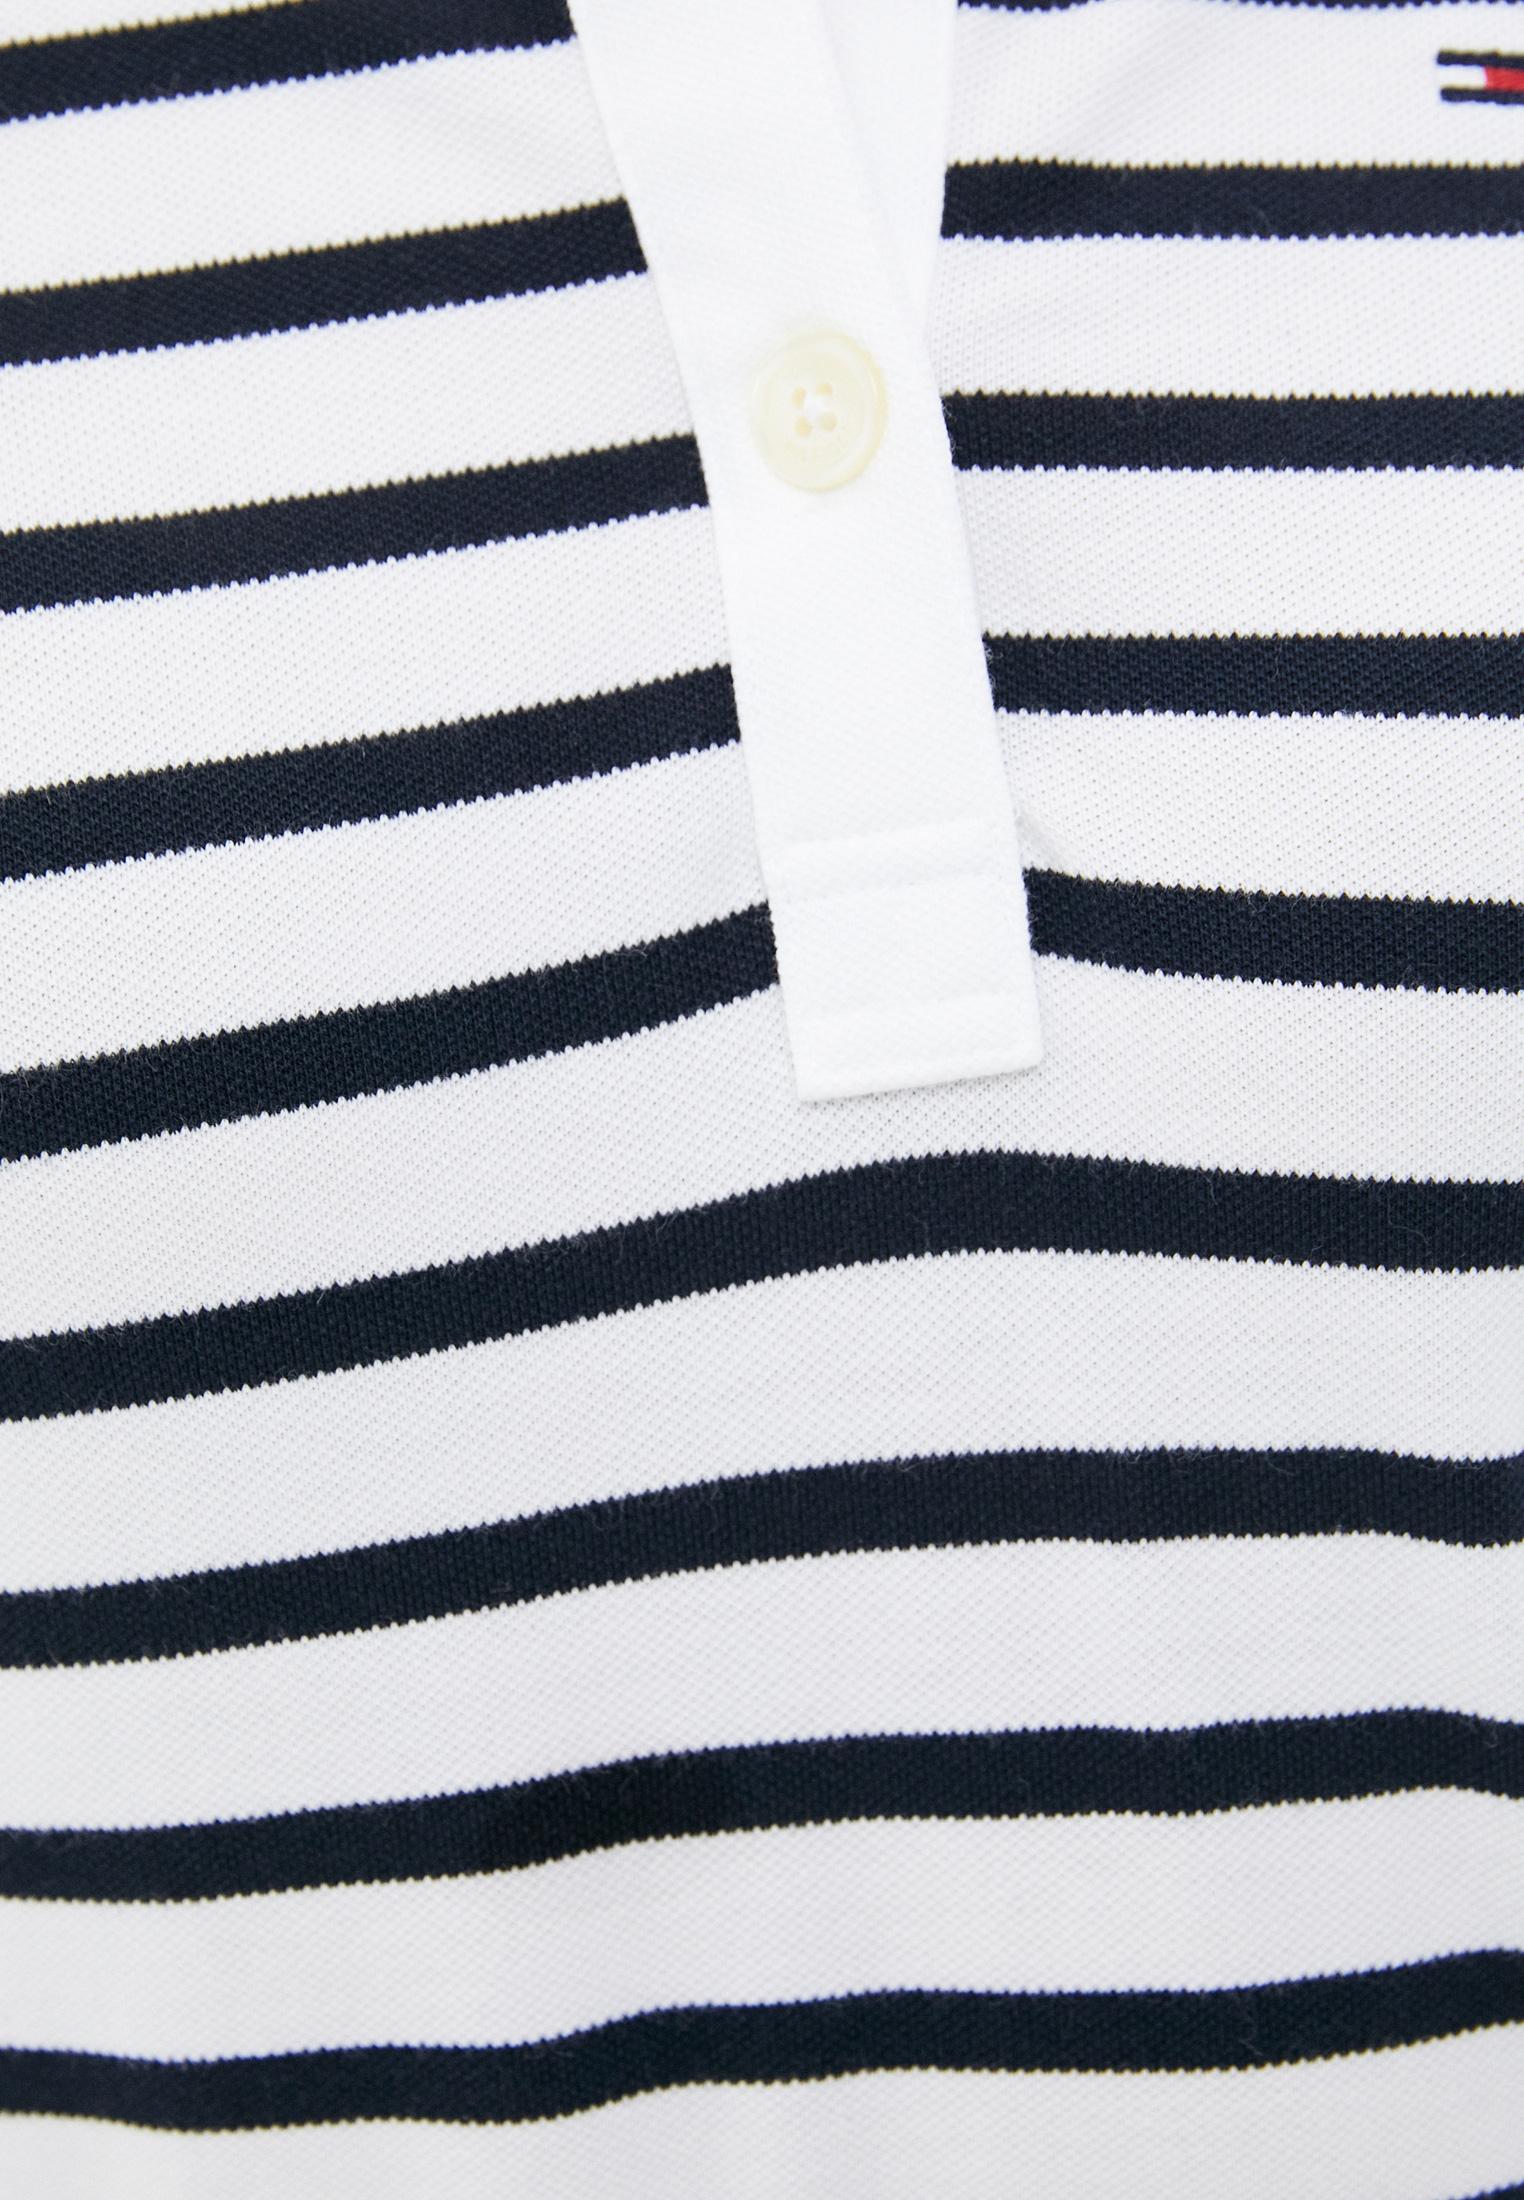 Платье Tommy Hilfiger (Томми Хилфигер) WW0WW30370: изображение 4